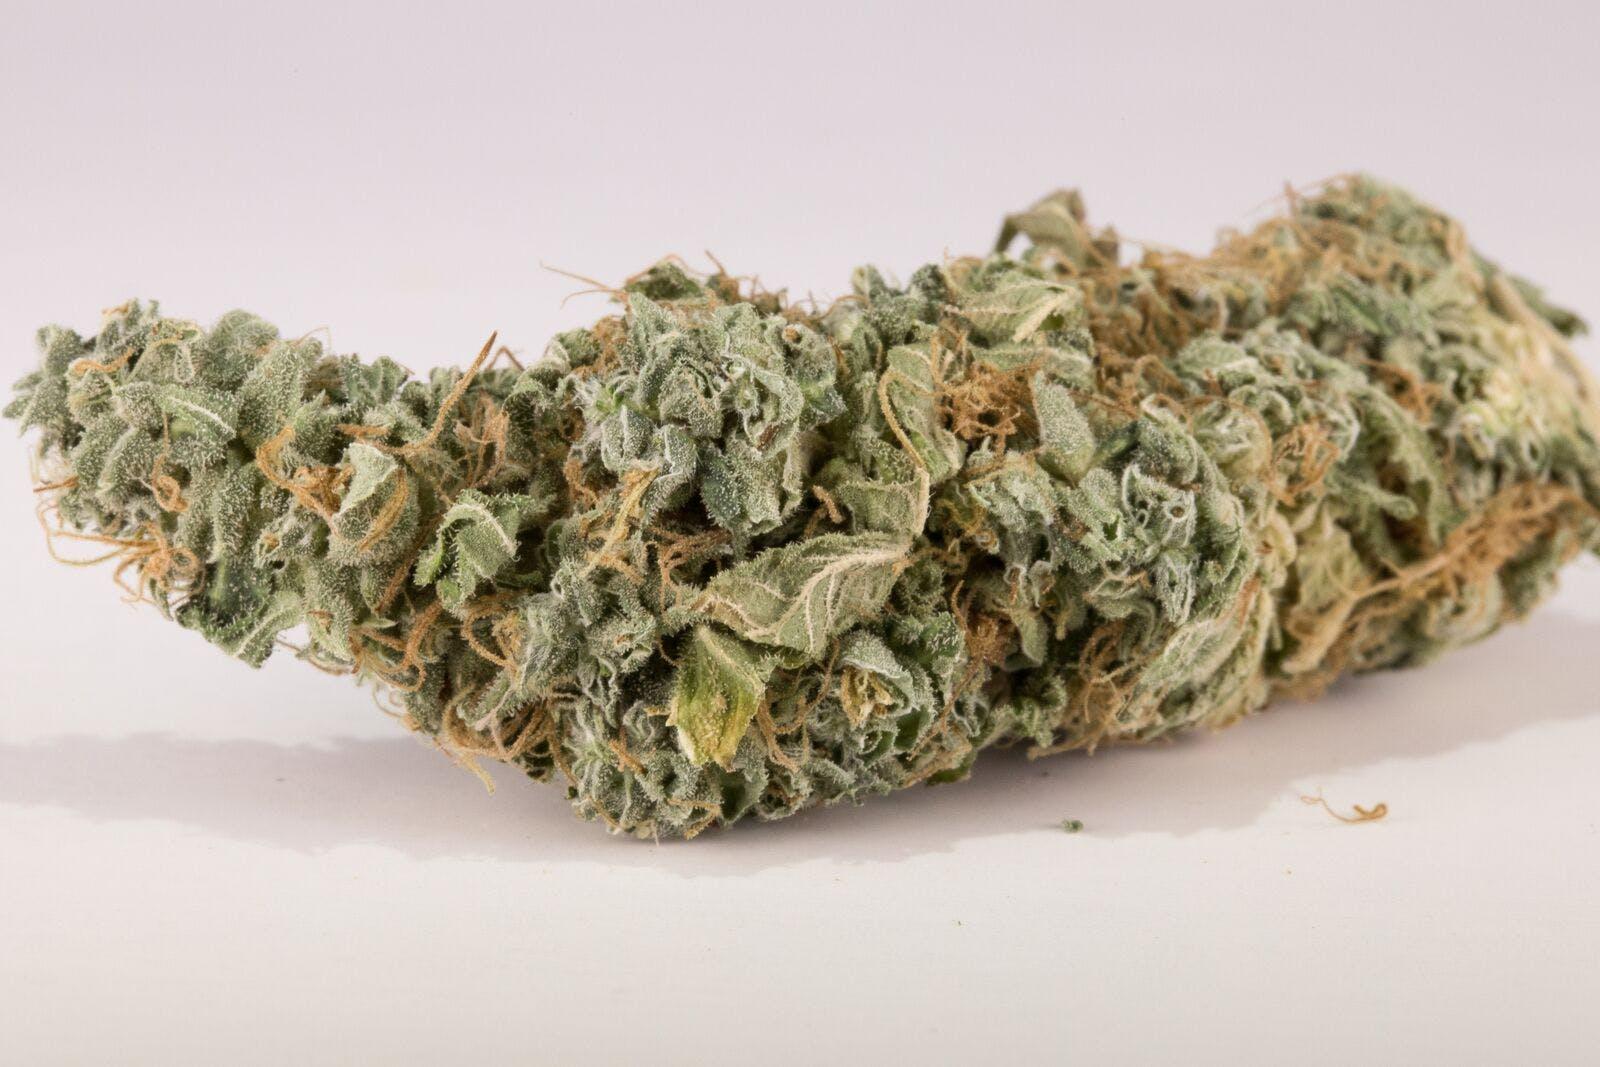 Rene Haze Weed; Rene Haze Cannabis Strain; Rene Haze Sativa Marijuana Strain